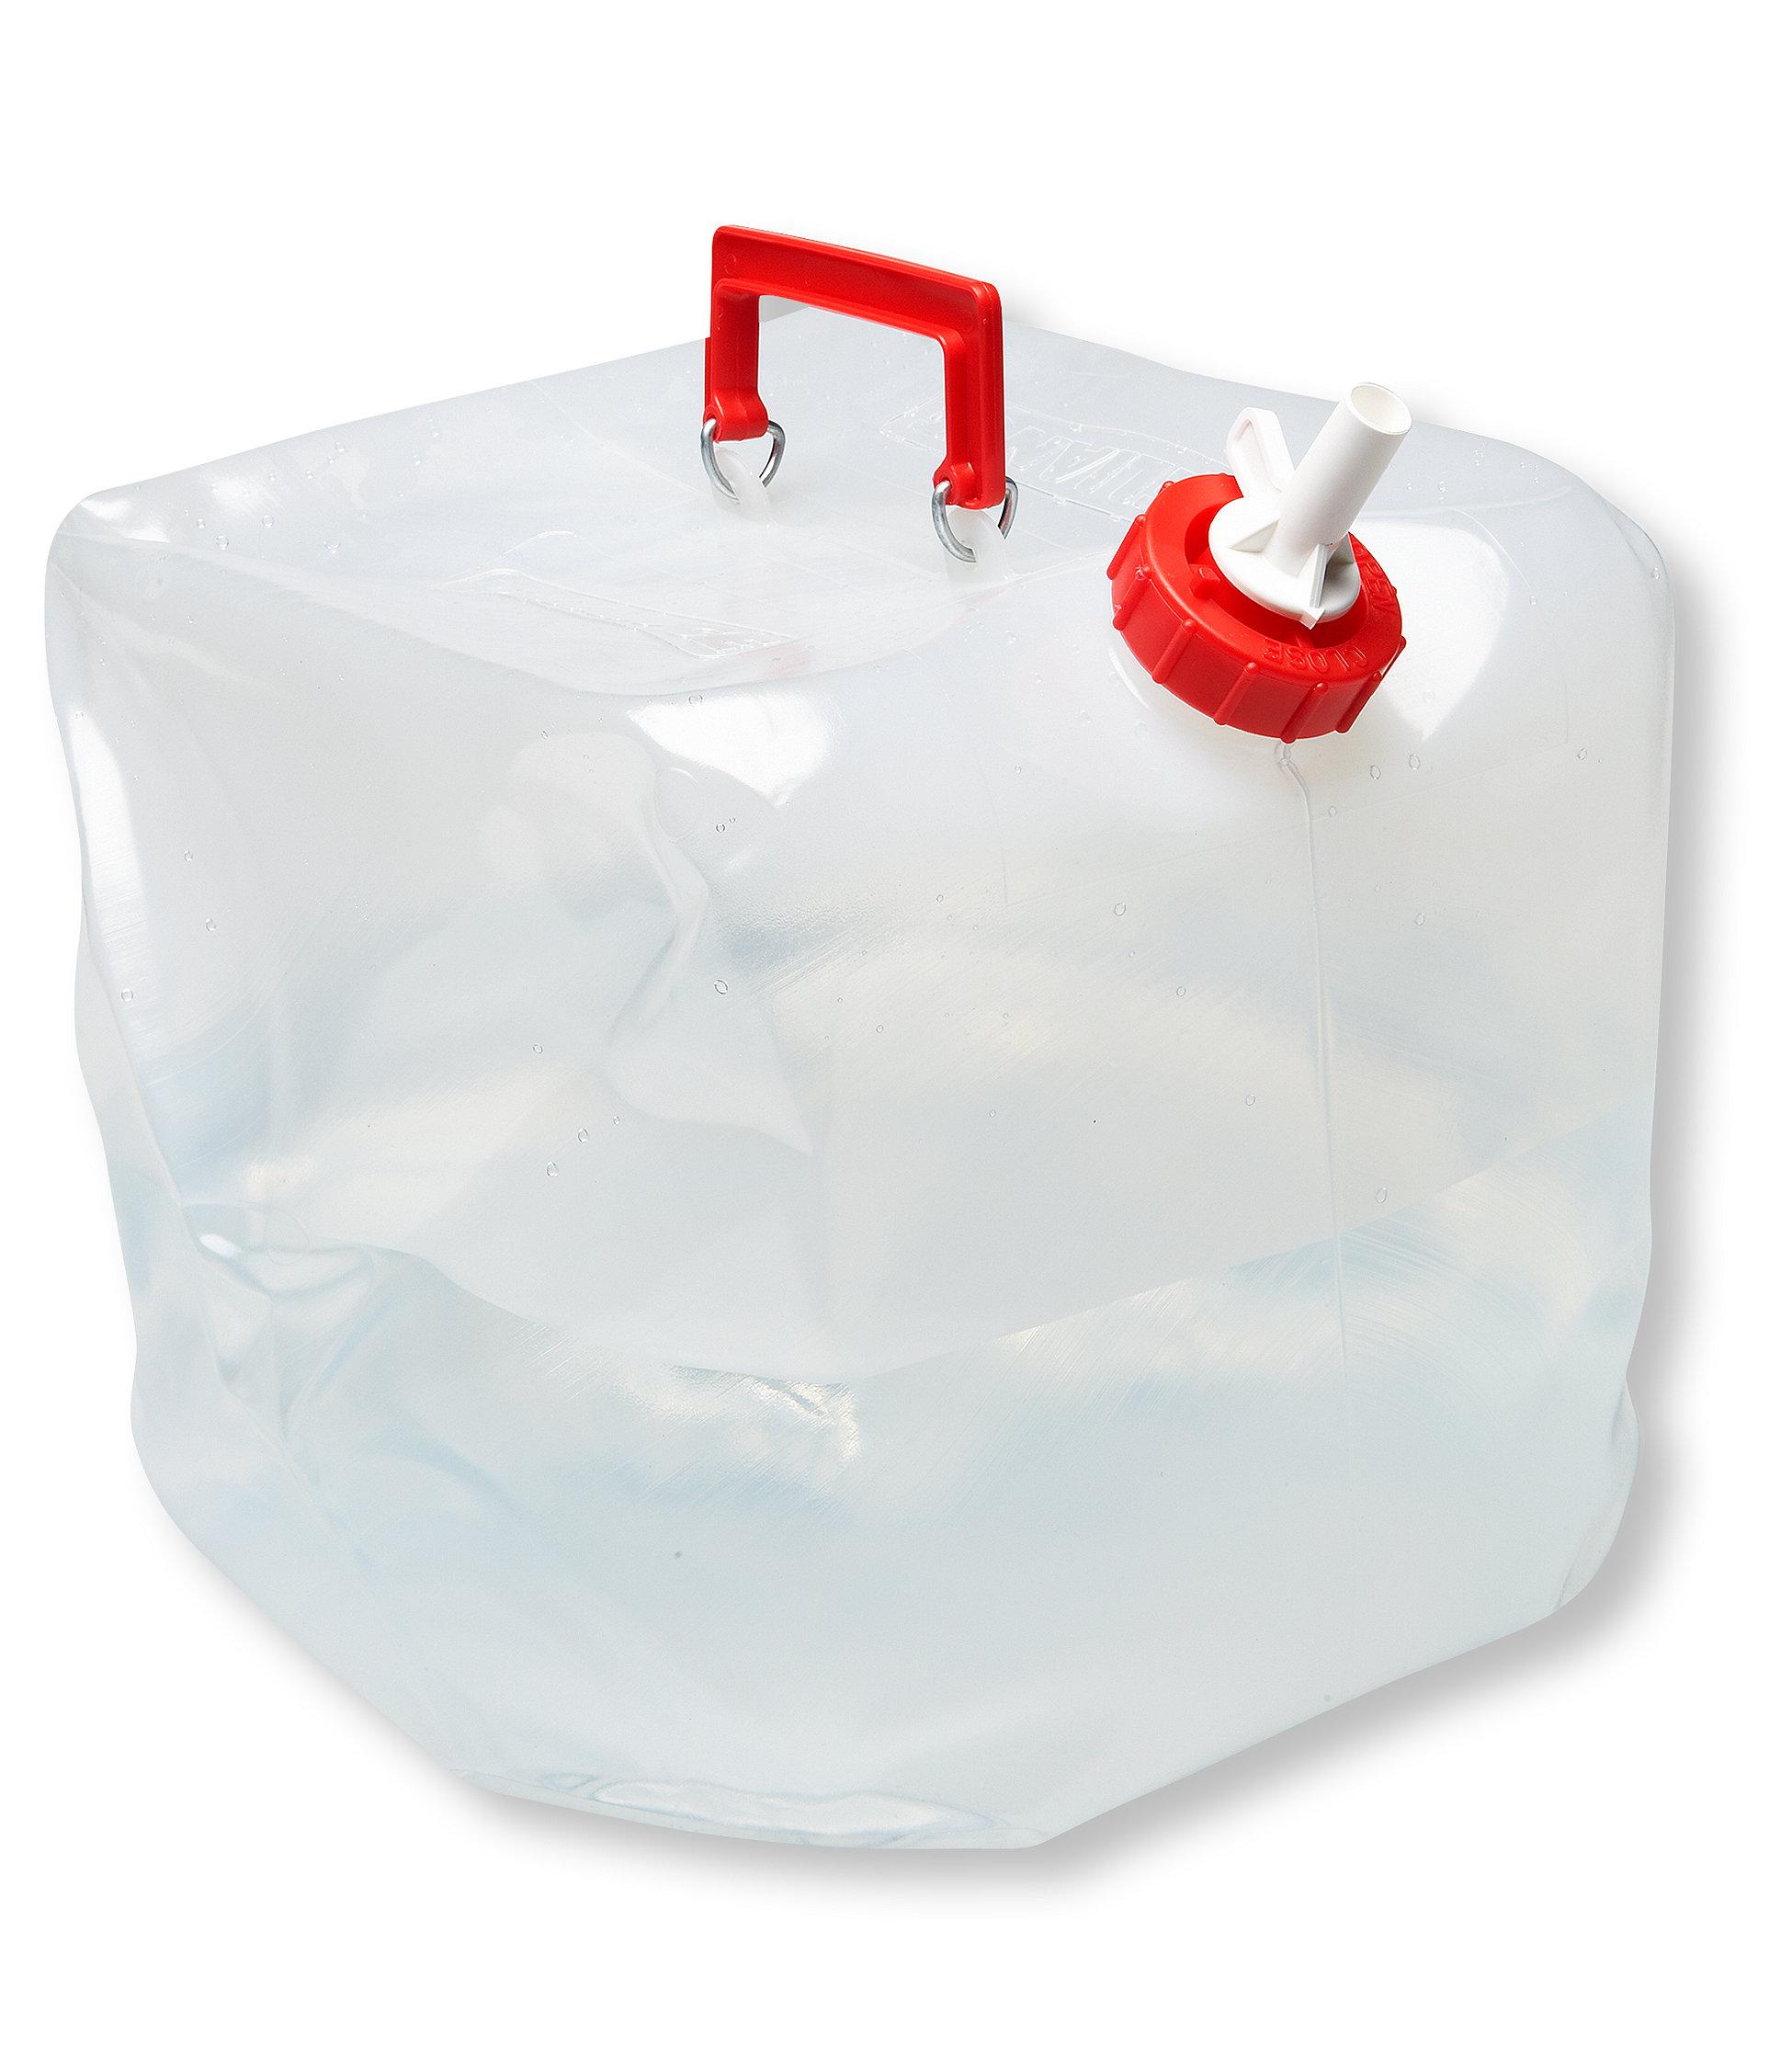 Liberty Mountain Reliance 5-Gallon Folding Water Jug